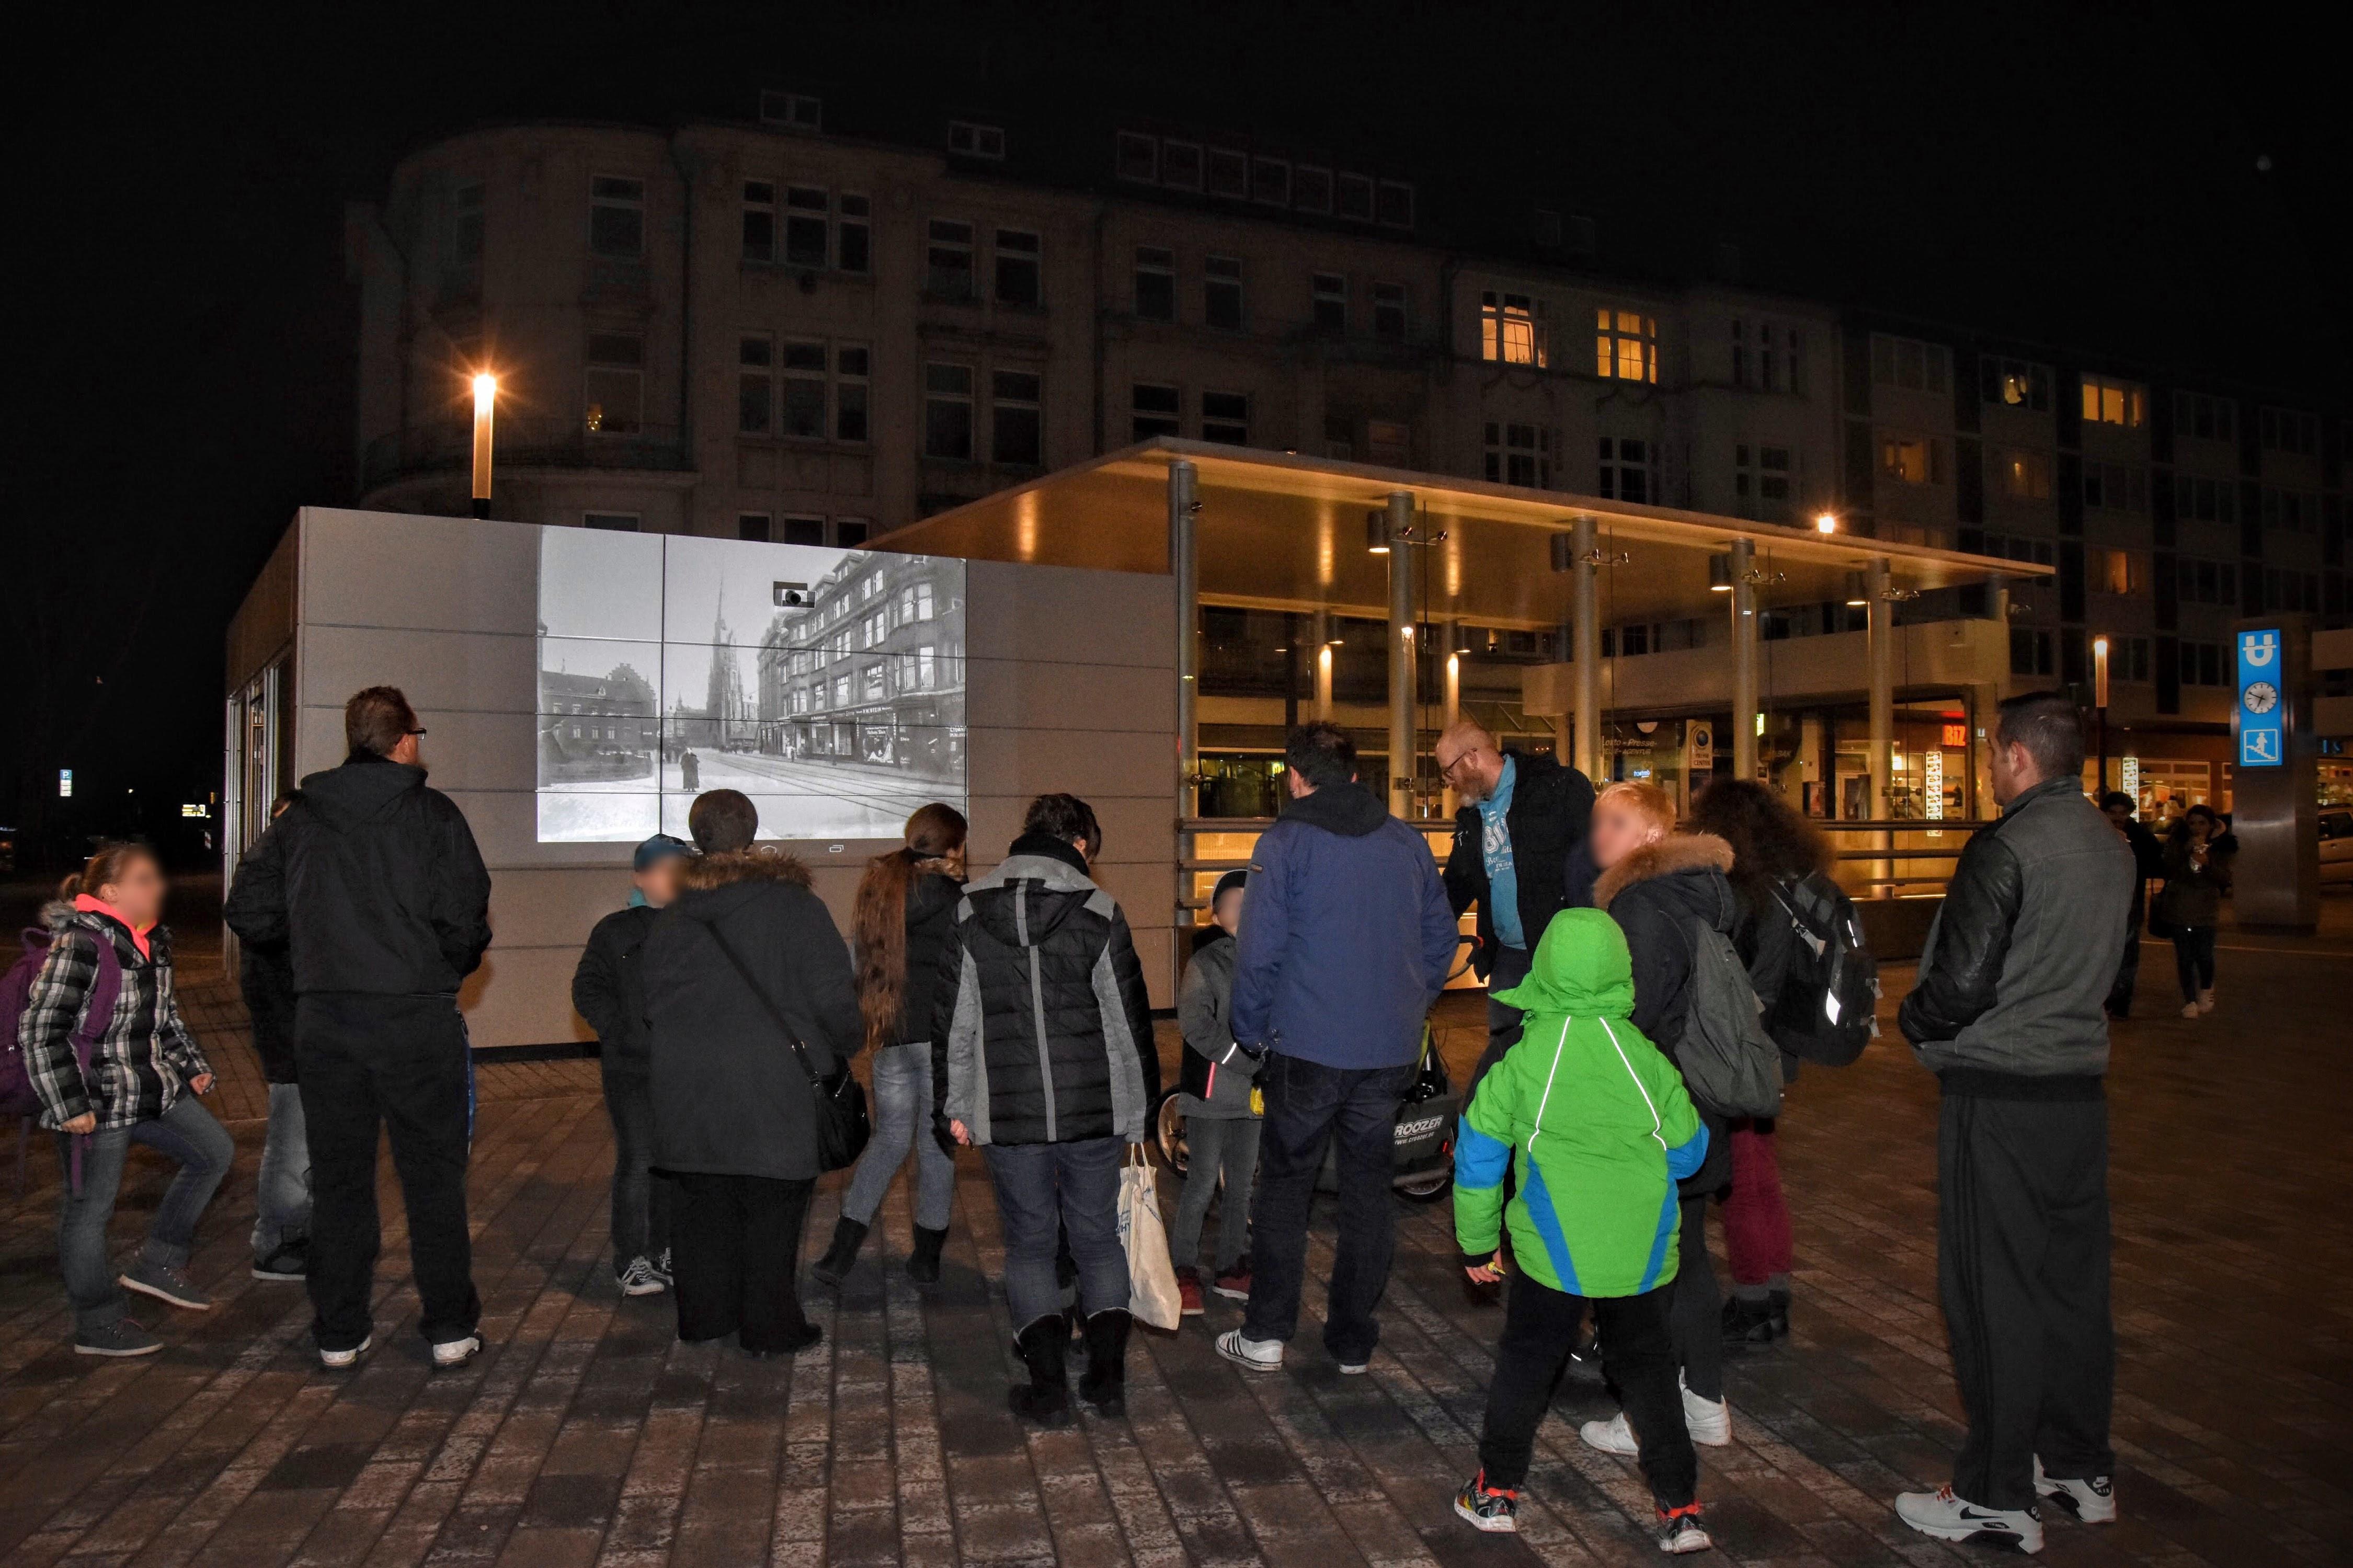 Umweltdiplom - Haltestelle Heinrich-König-Platz